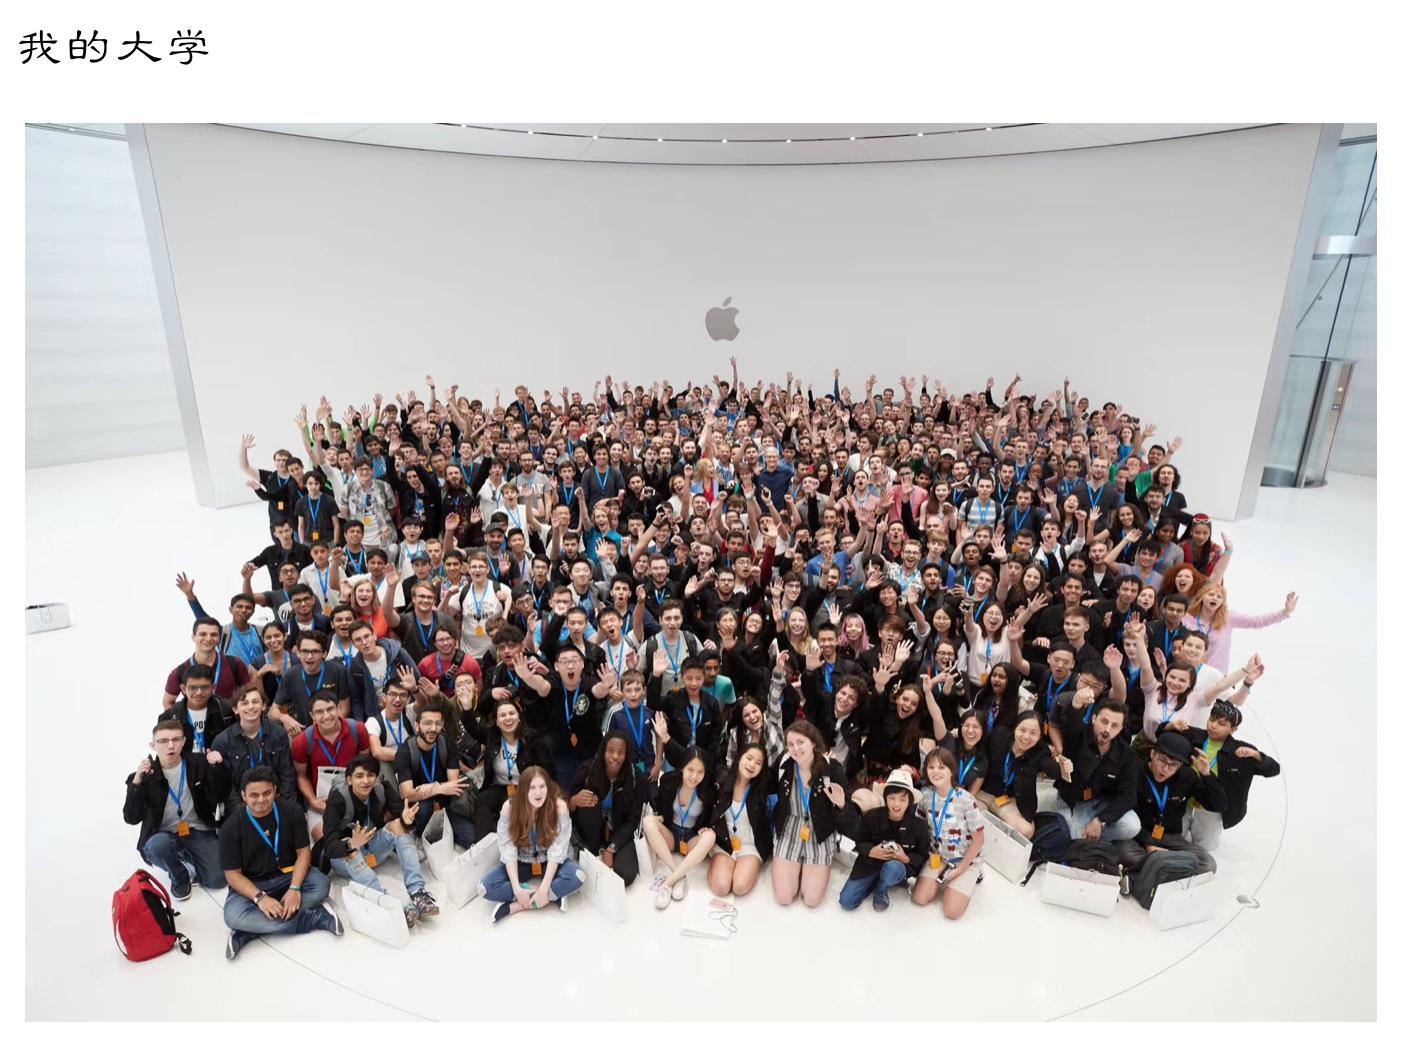 WWDC18 350 位奖学金得主合影